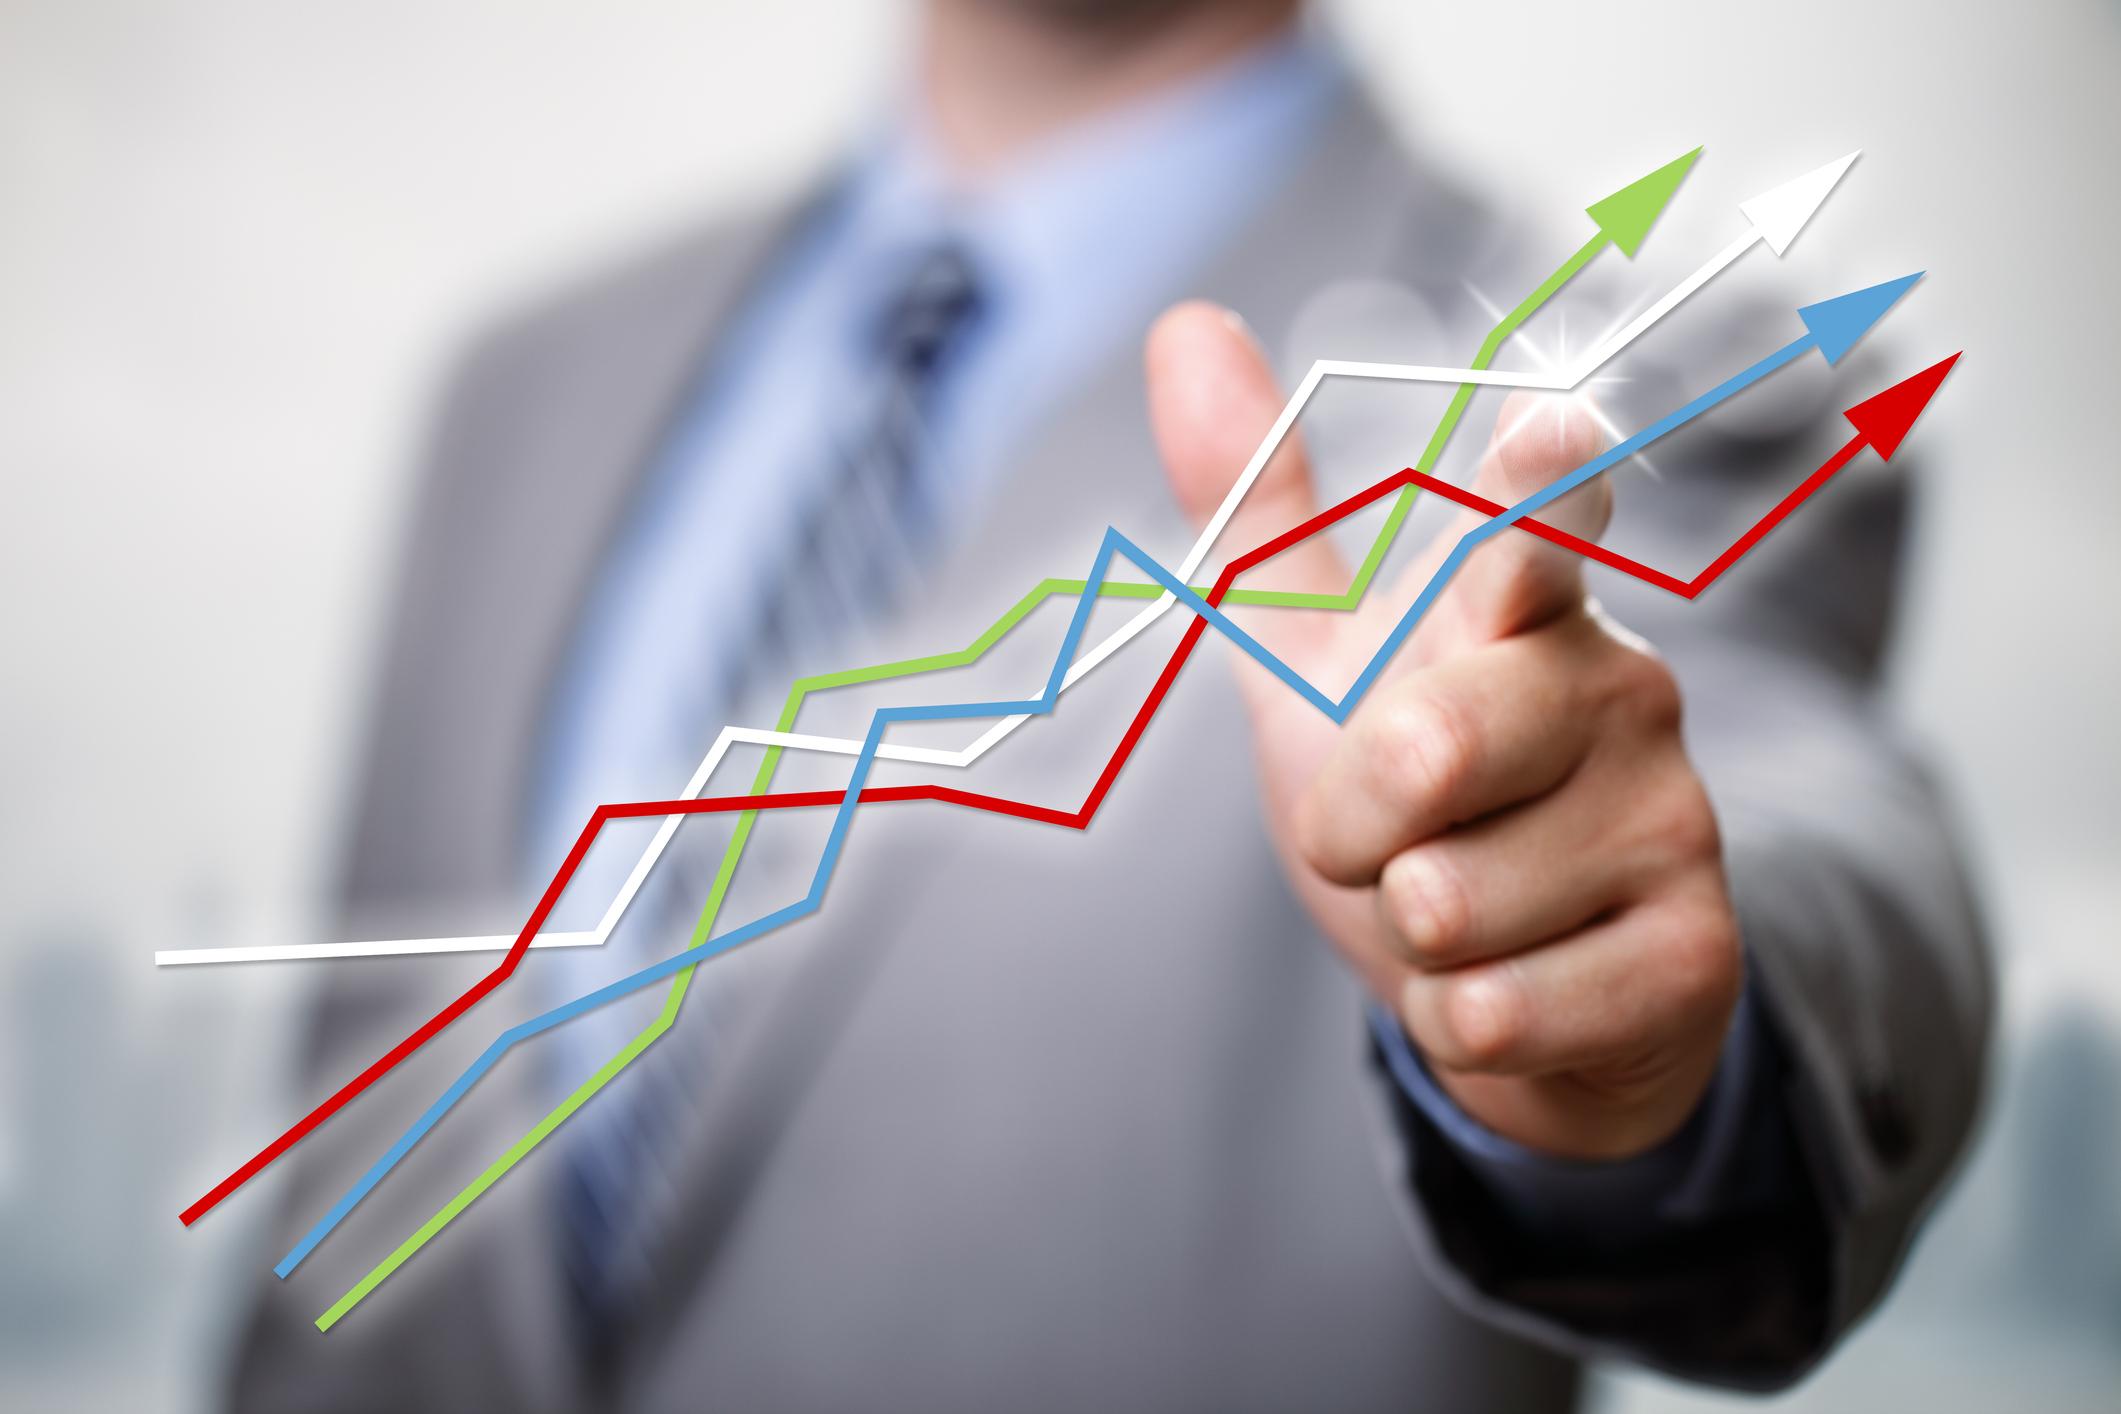 Man pointing to upward graphs.